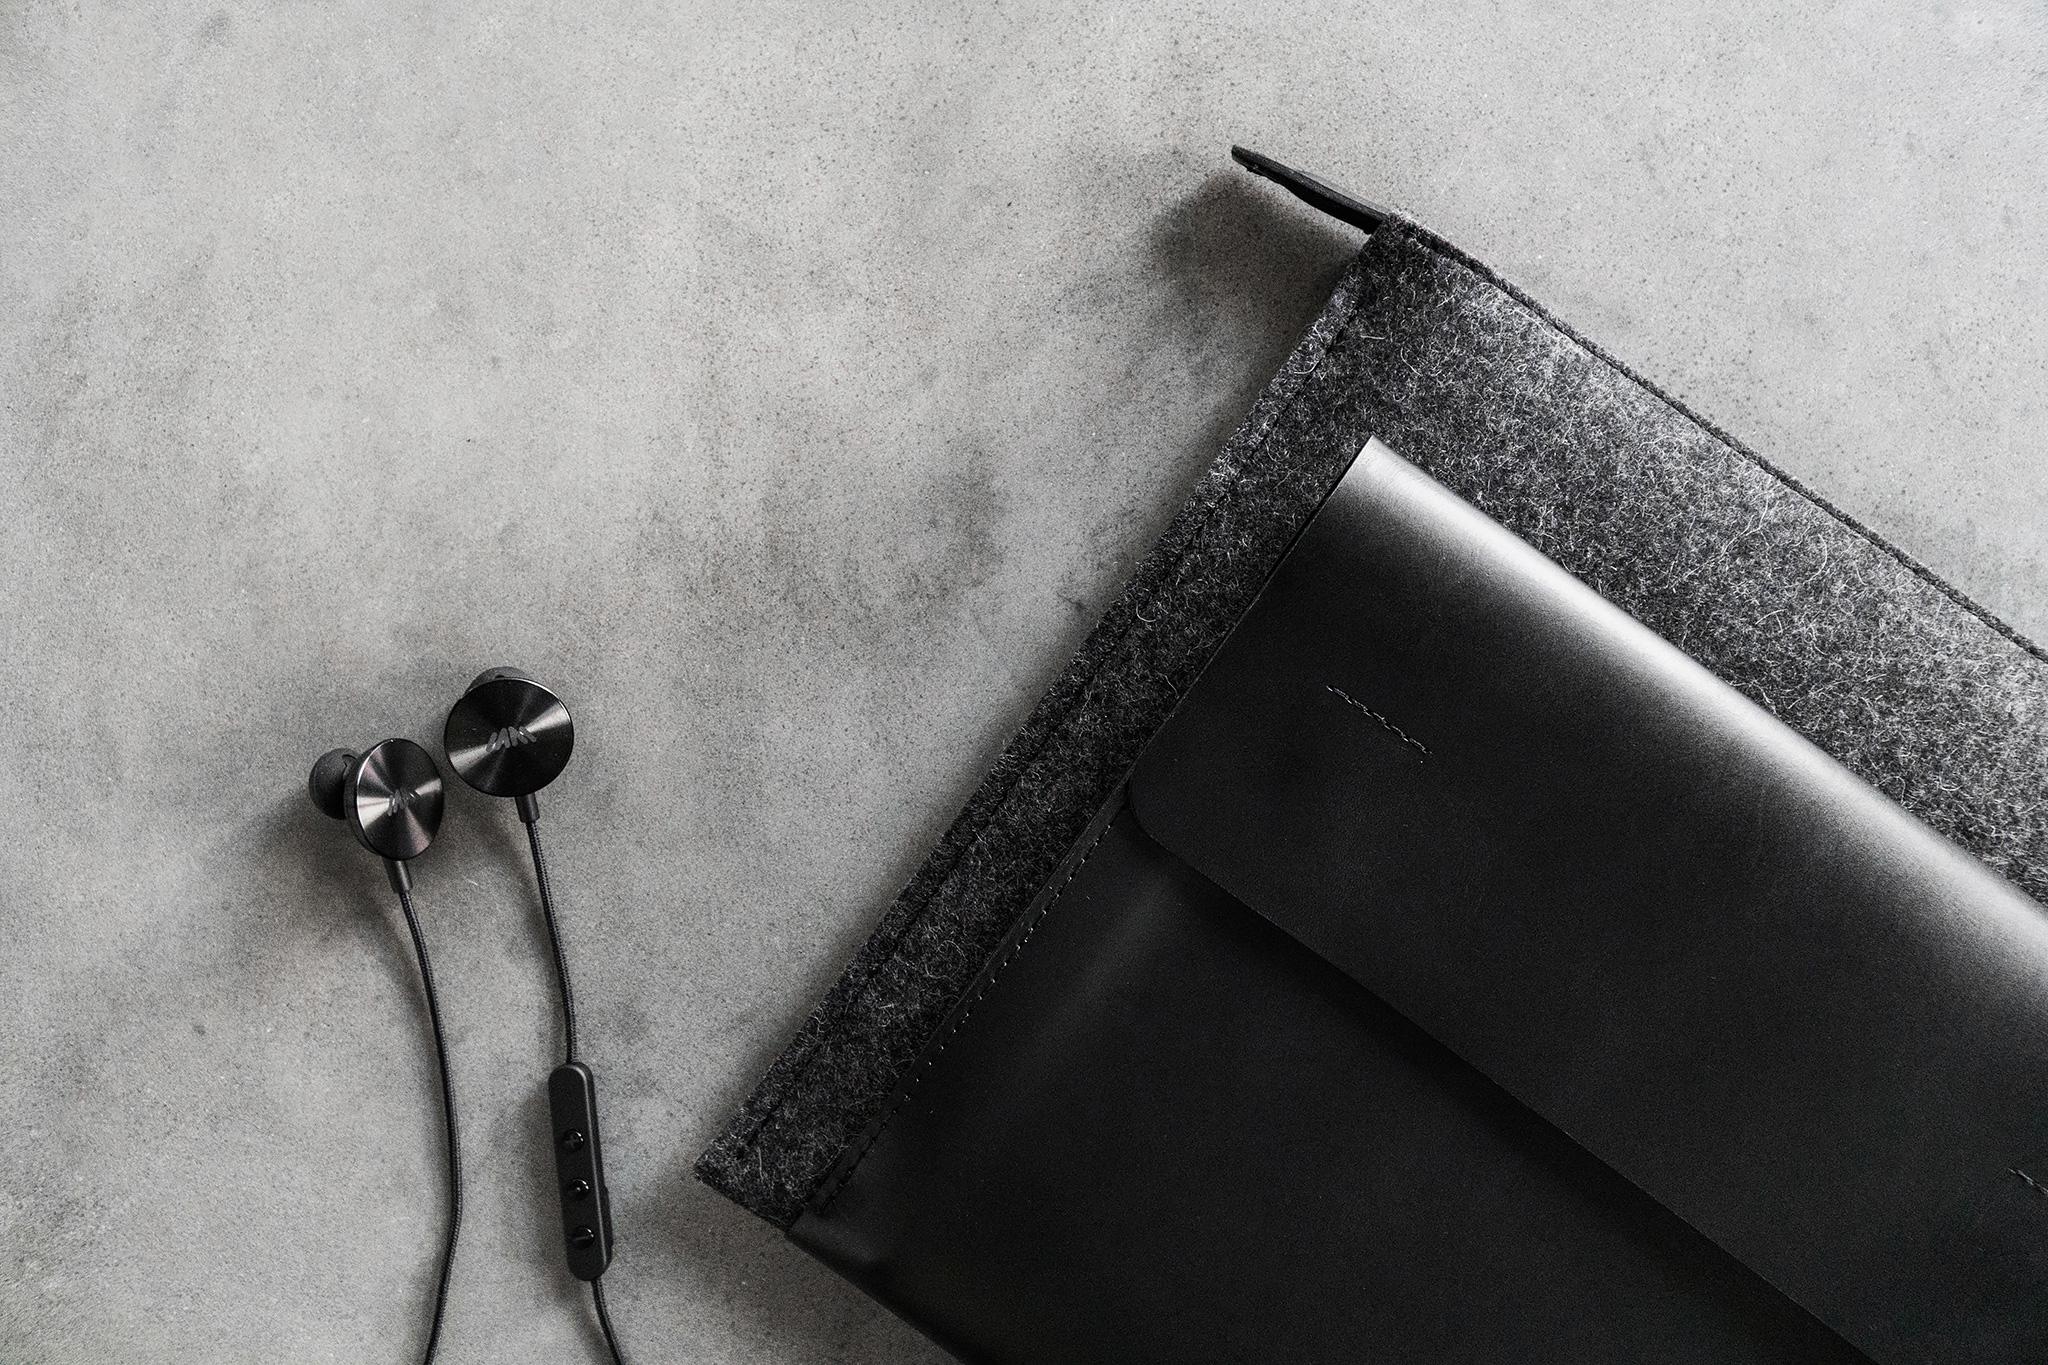 MacBook Pro Retina Sleeve Etsy Cinnamon Cocoon Review